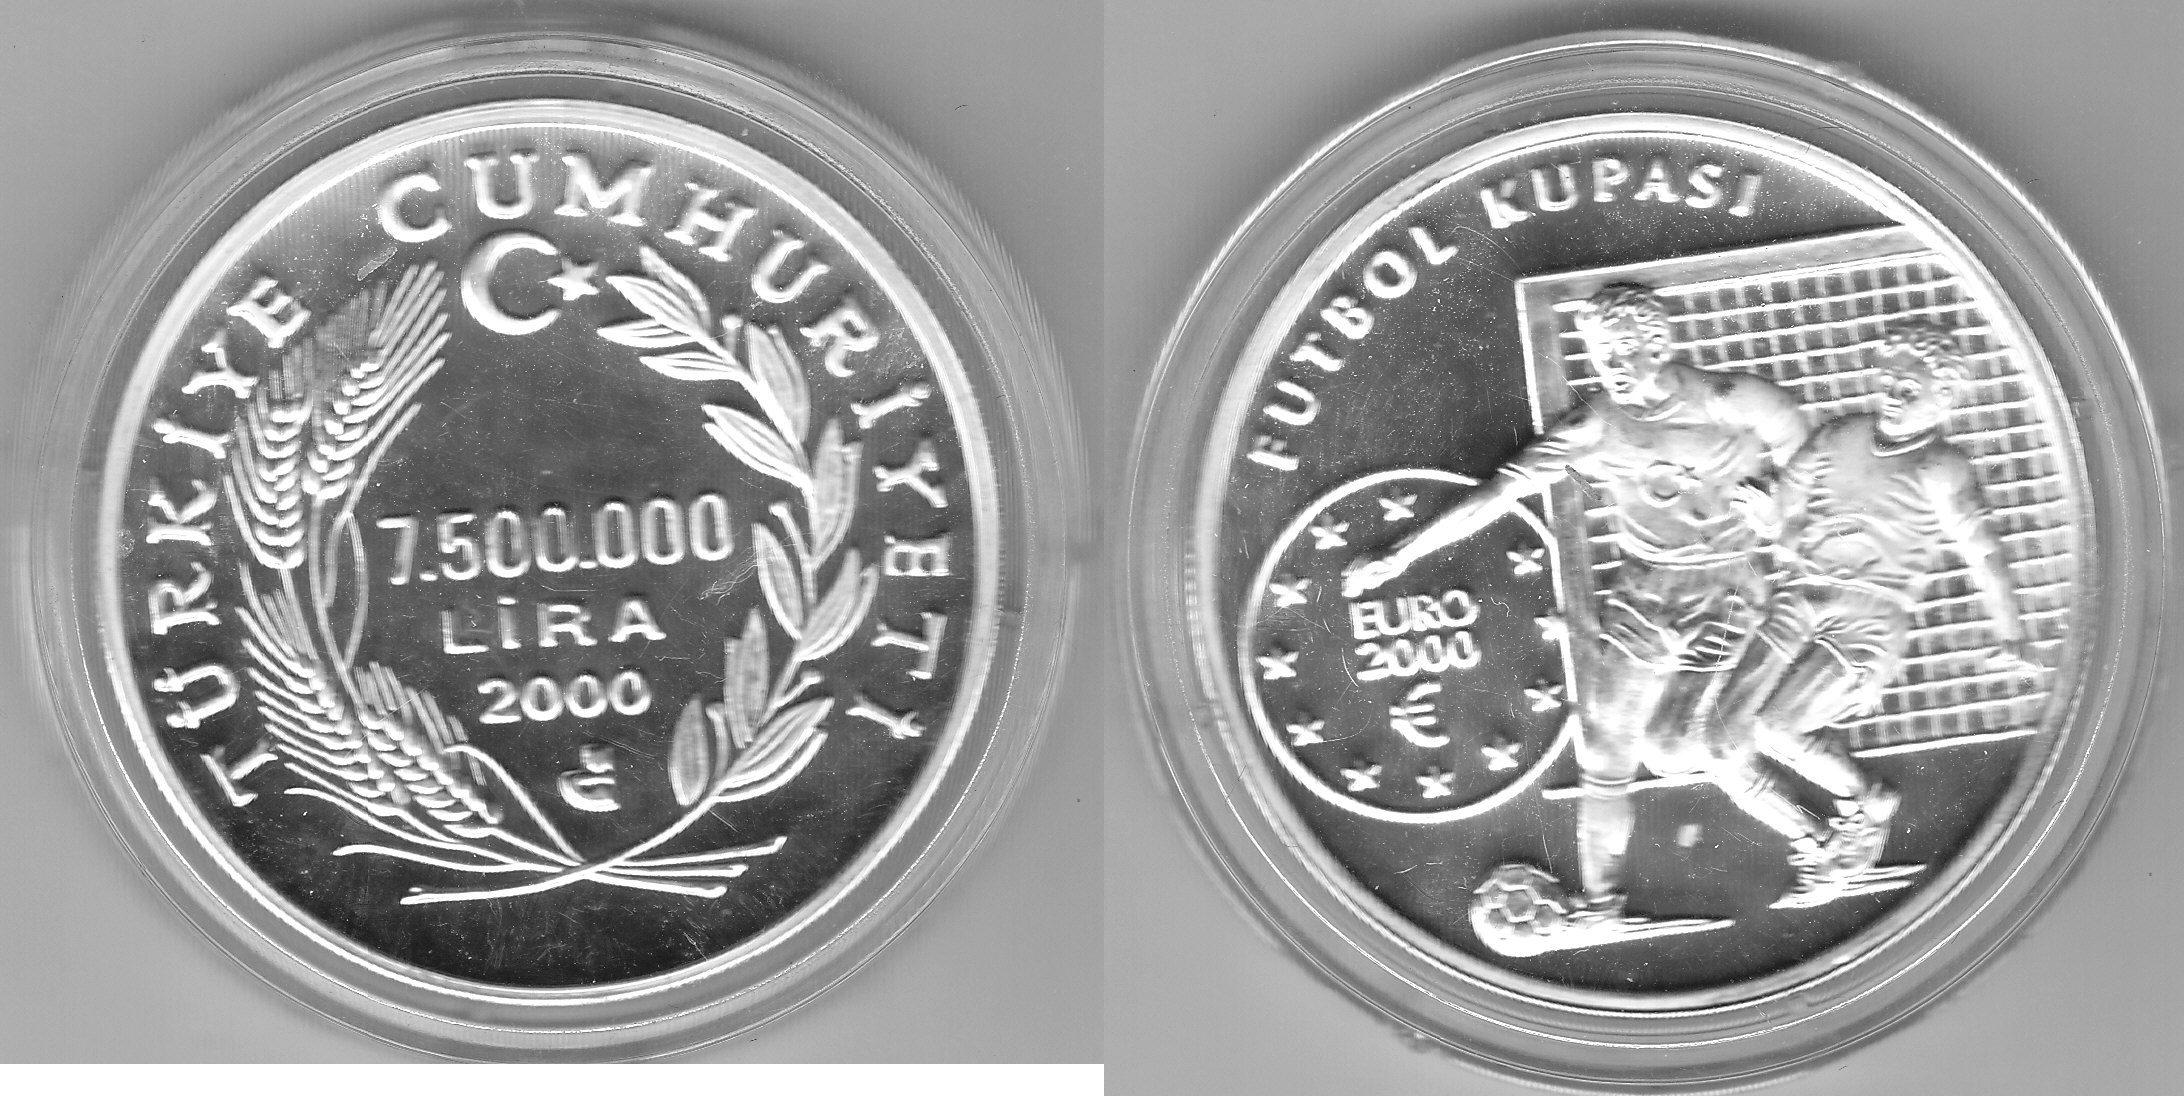 Türkei 7.500.000 Lira Fußball EM 2000 proof